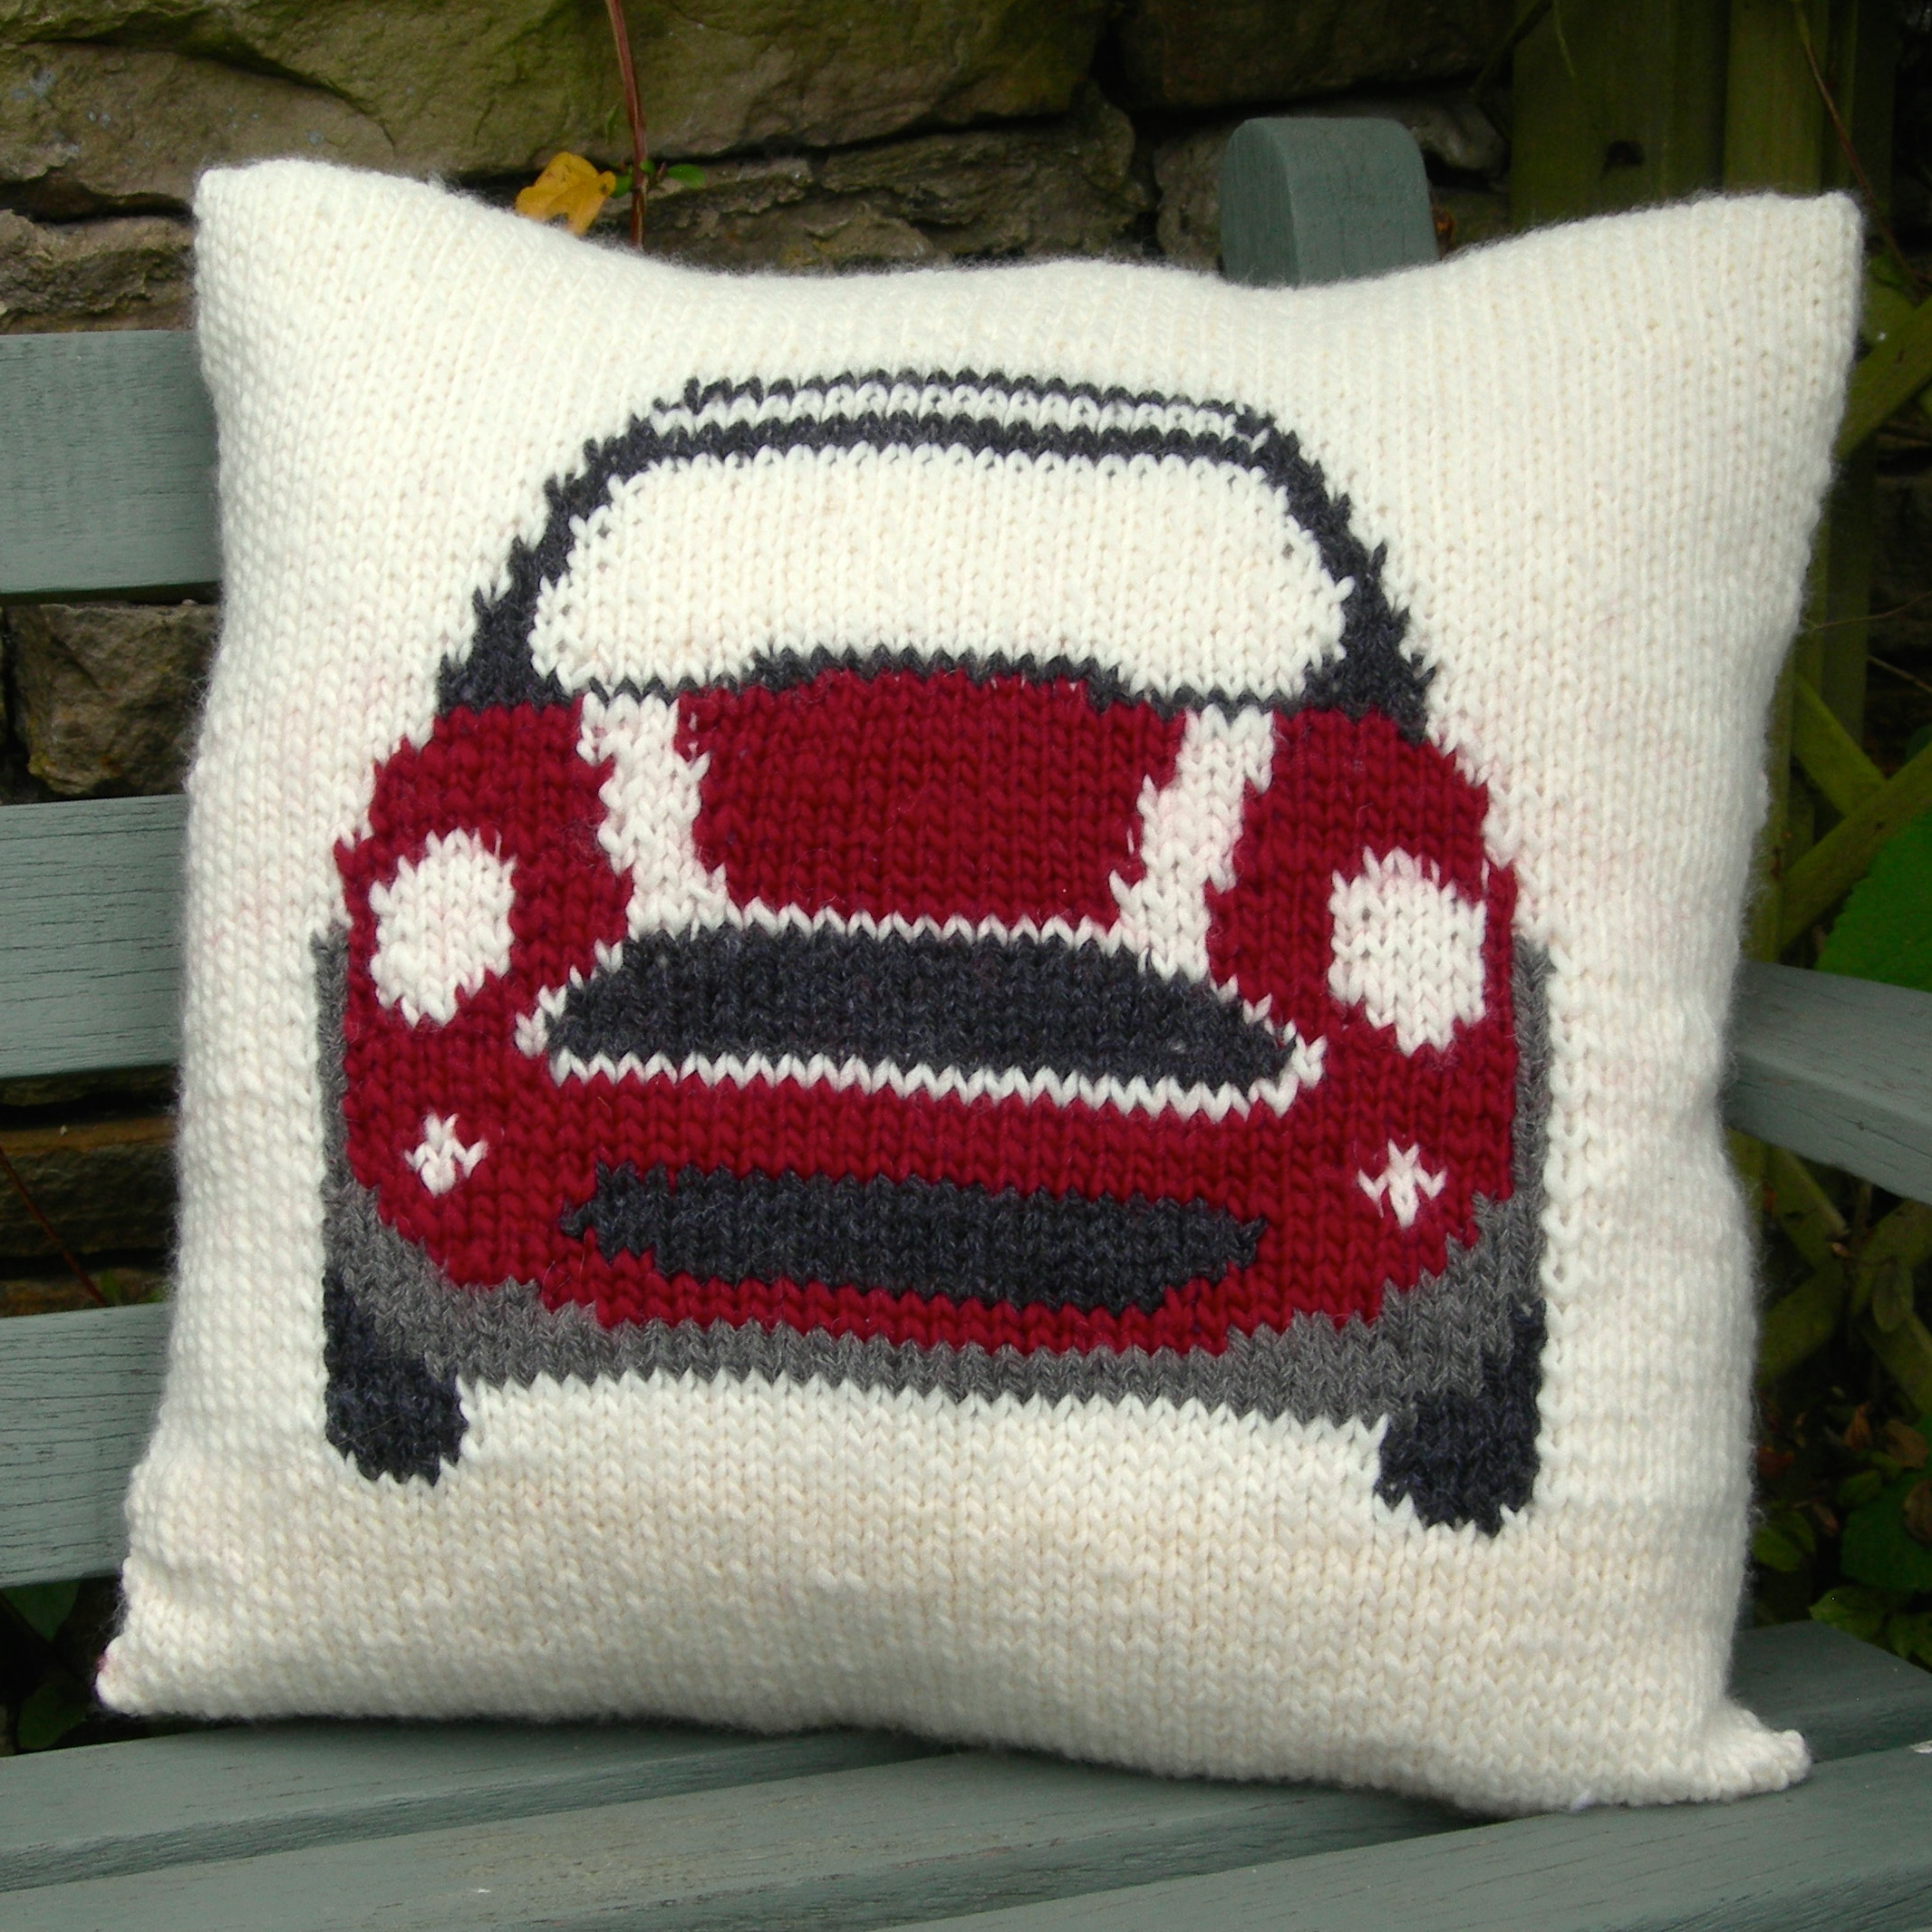 PDF Knitting Pattern for a Mini Cushion Cover - Slightly Sheepish